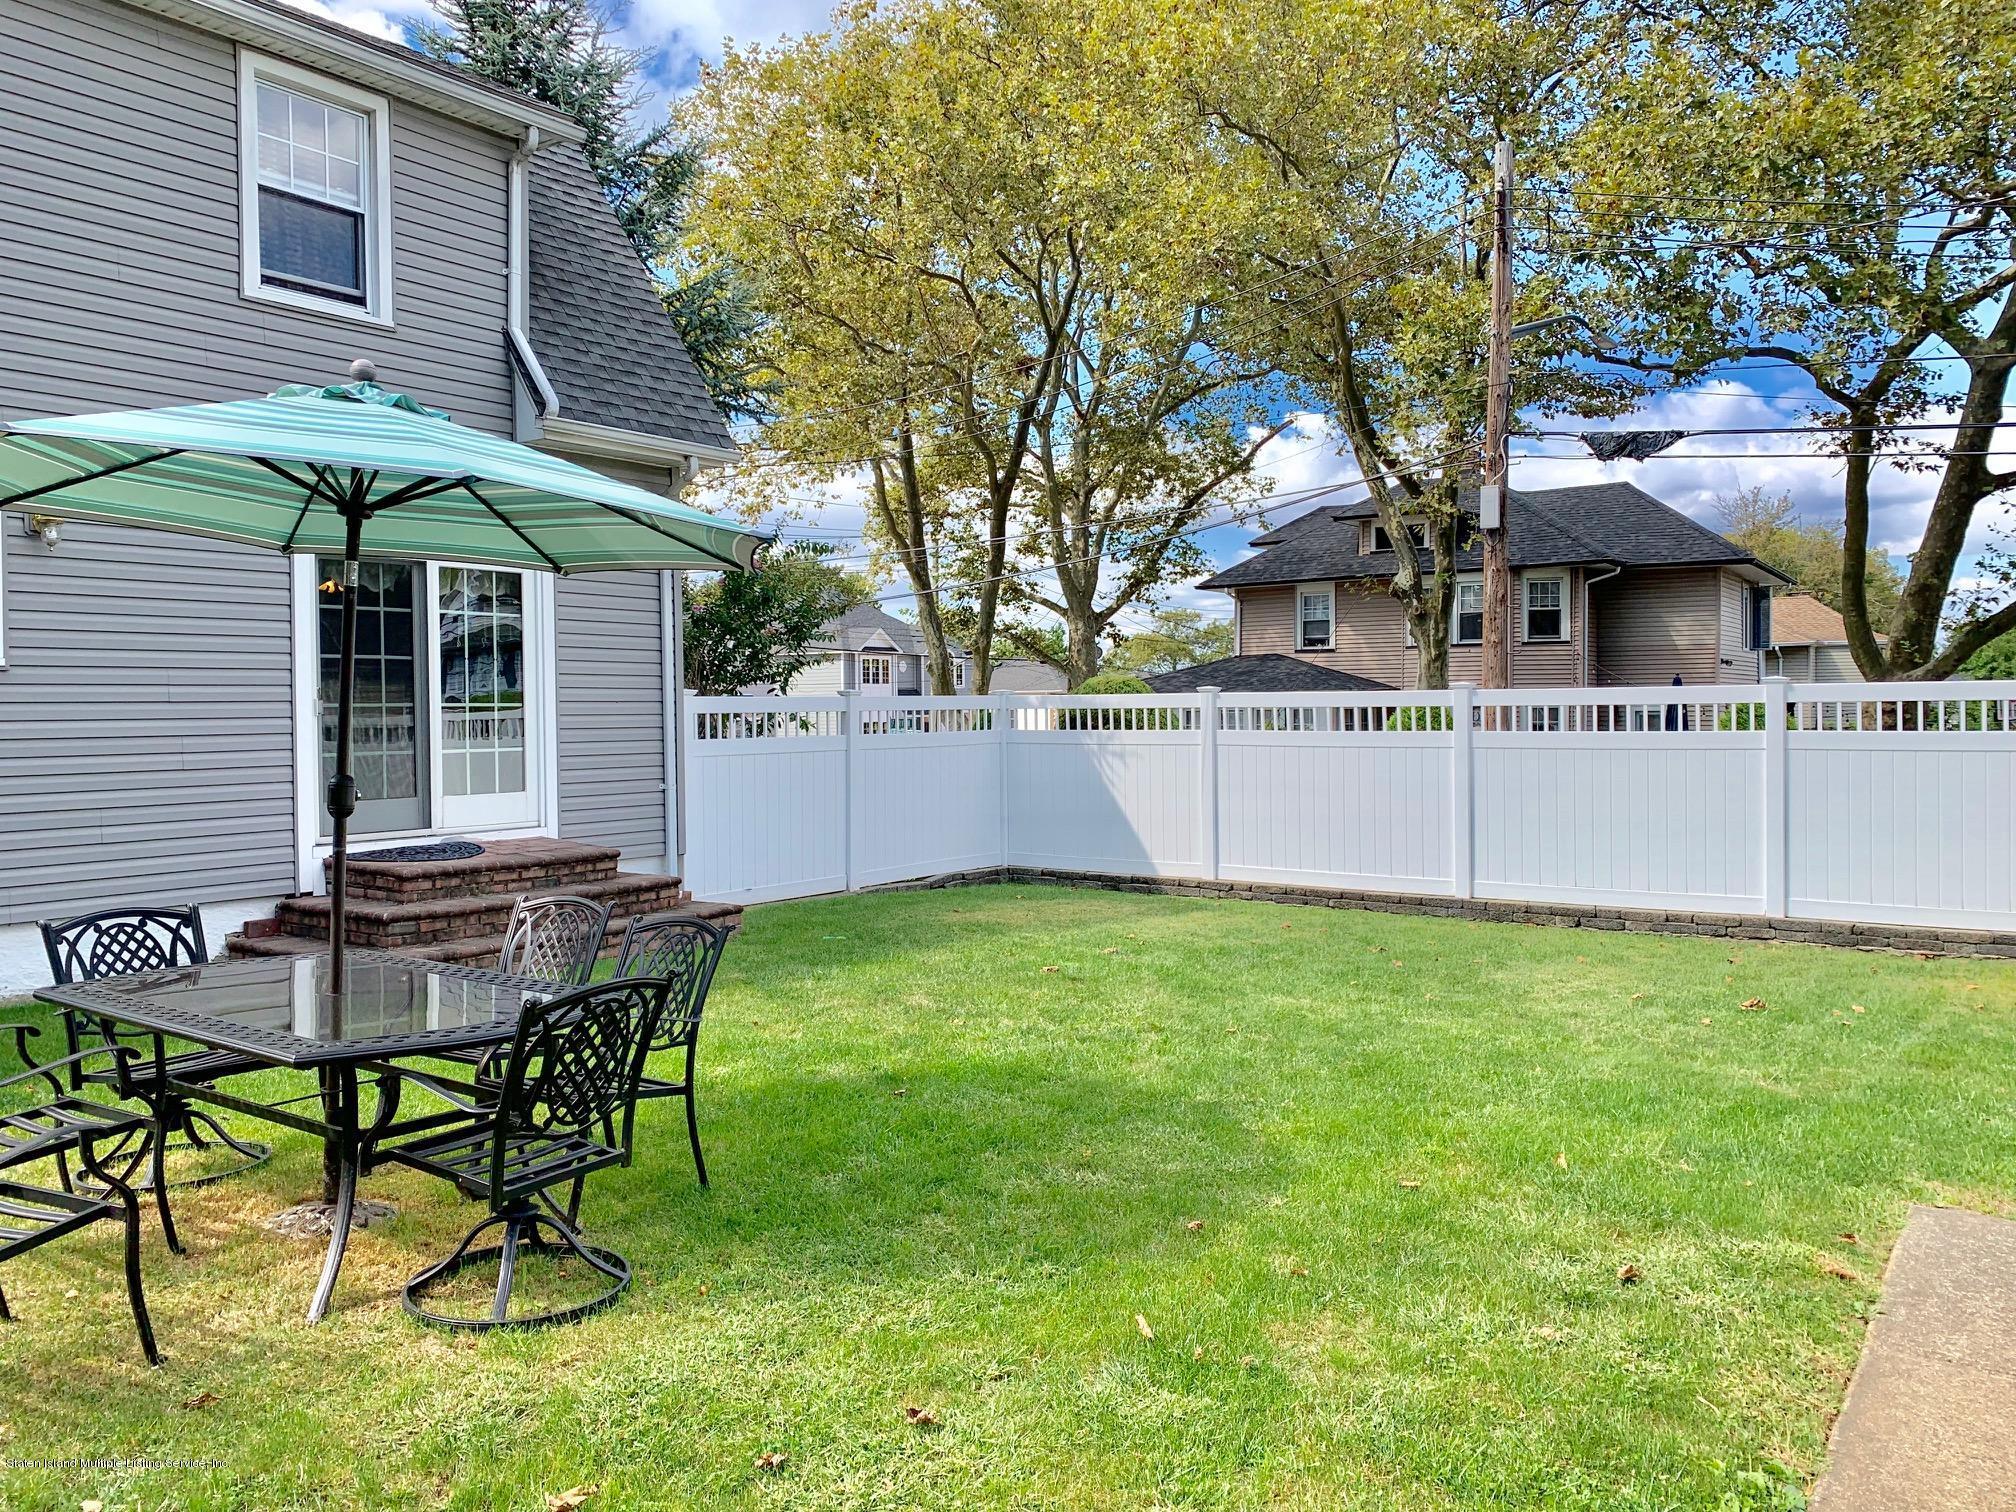 Single Family - Detached 195 Fairview Avenue  Staten Island, NY 10314, MLS-1132423-38